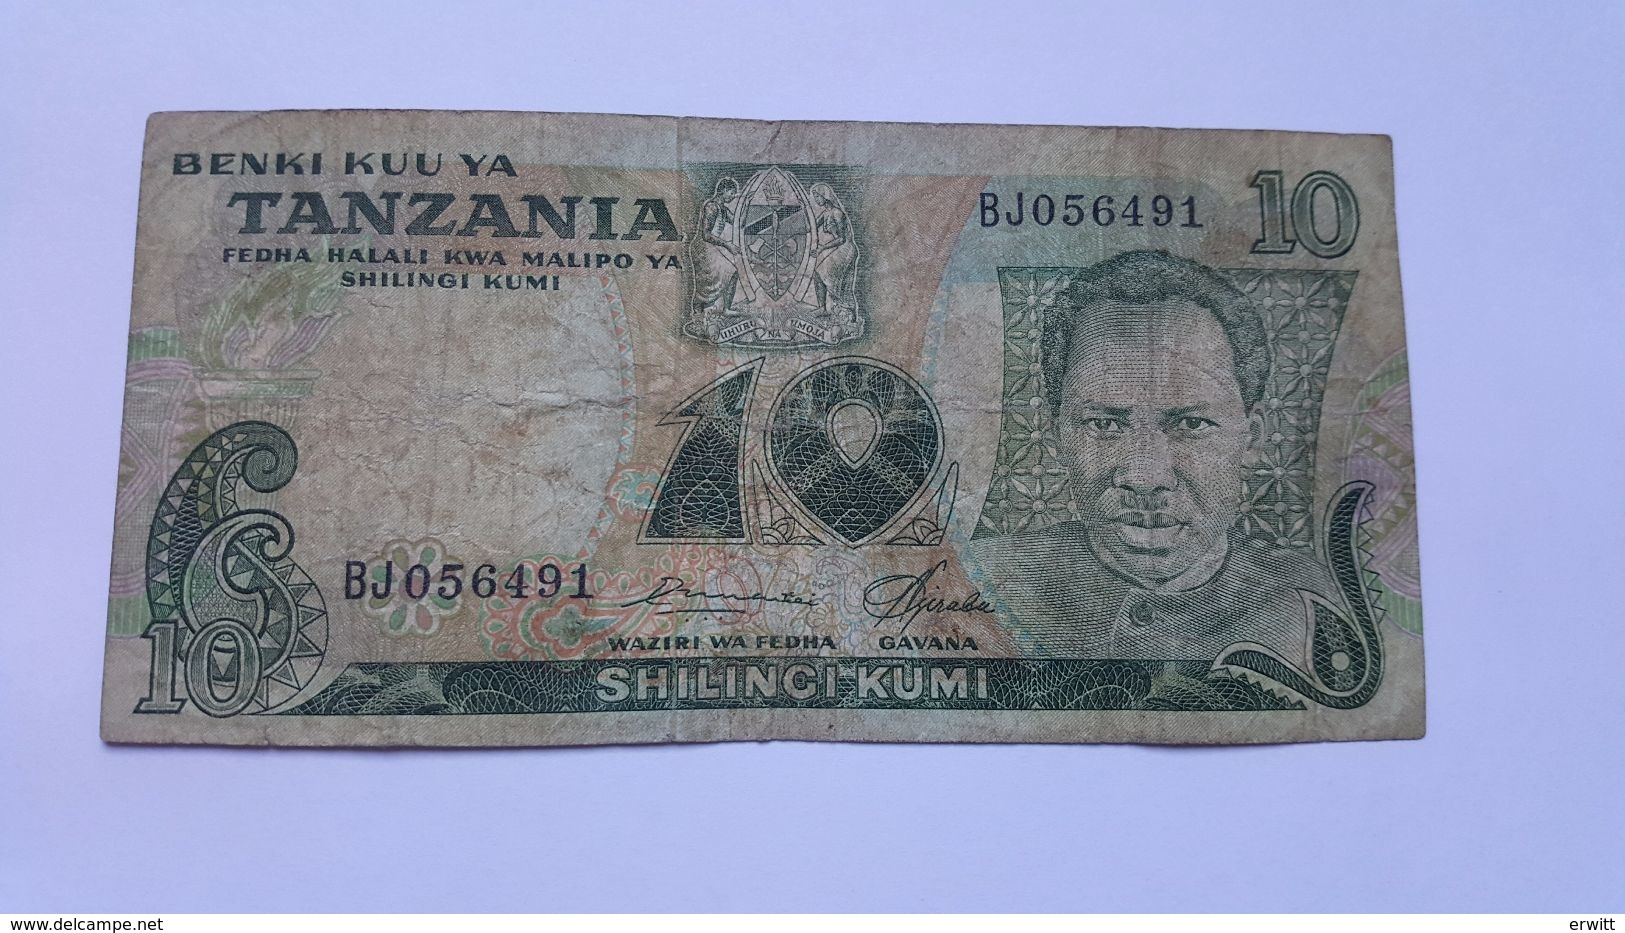 TANZANIA 10 SHILINGI 1978 - Tanzanie